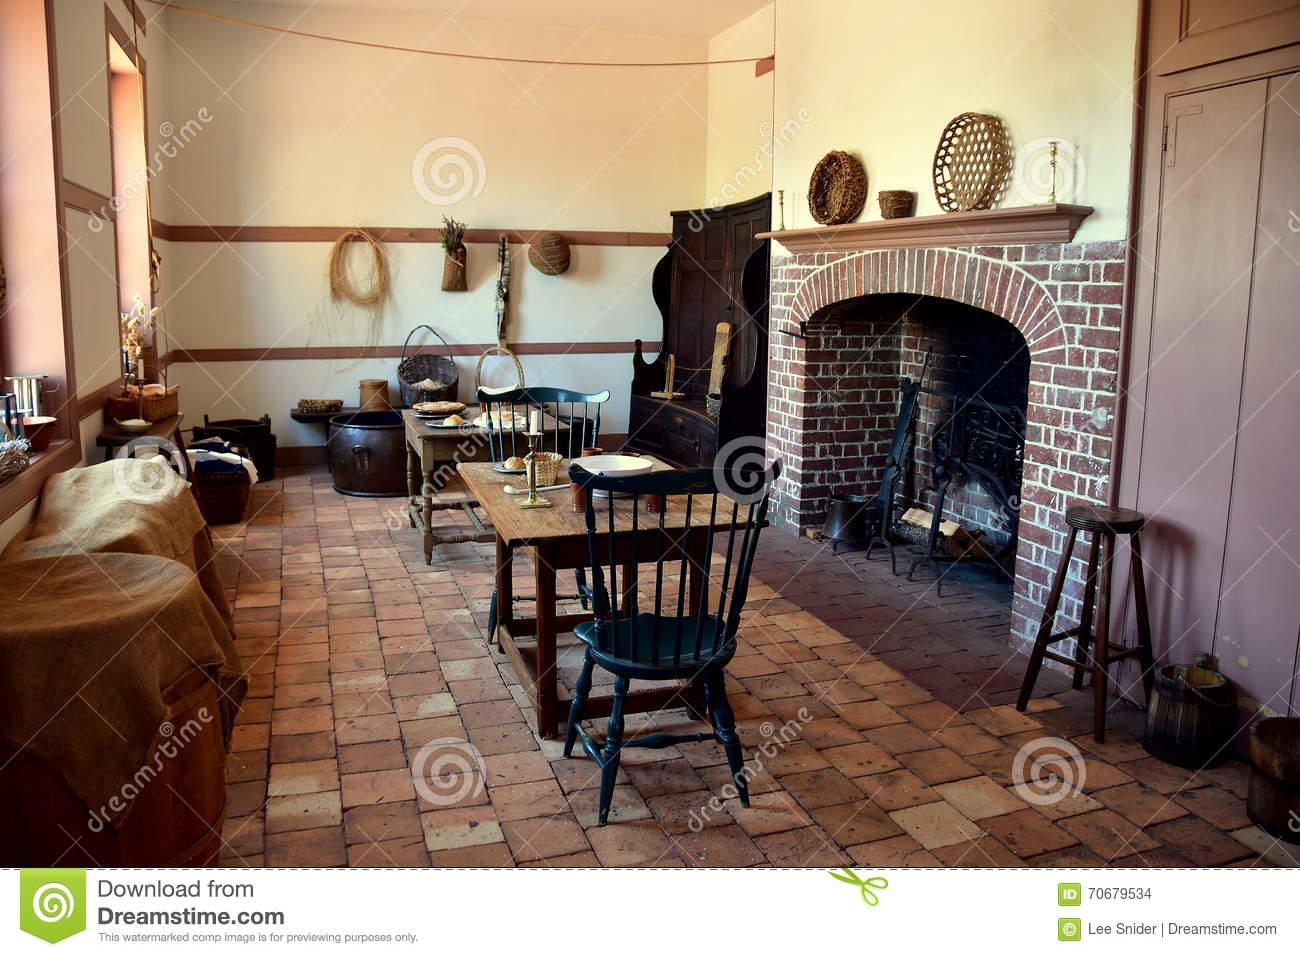 New Bern, NC: Kitchen Wing At 1770 Tryon Palace Editorial Stock.